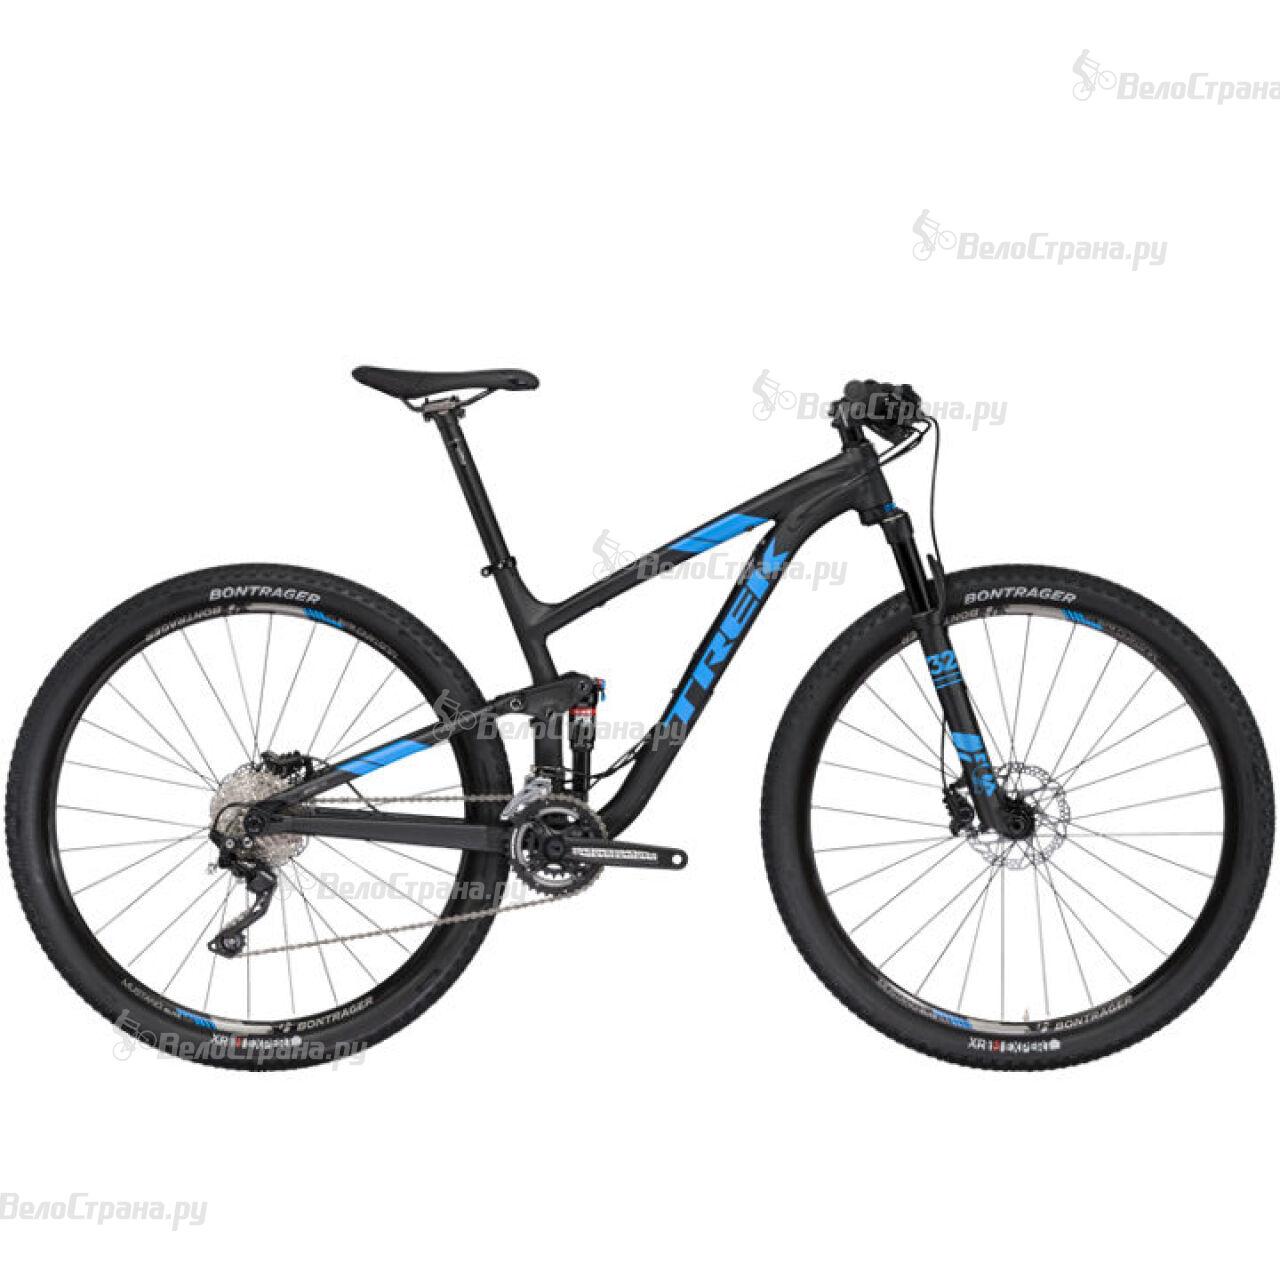 Велосипед Trek Top Fuel 8 (2017) trek fuel ex 9 27 5